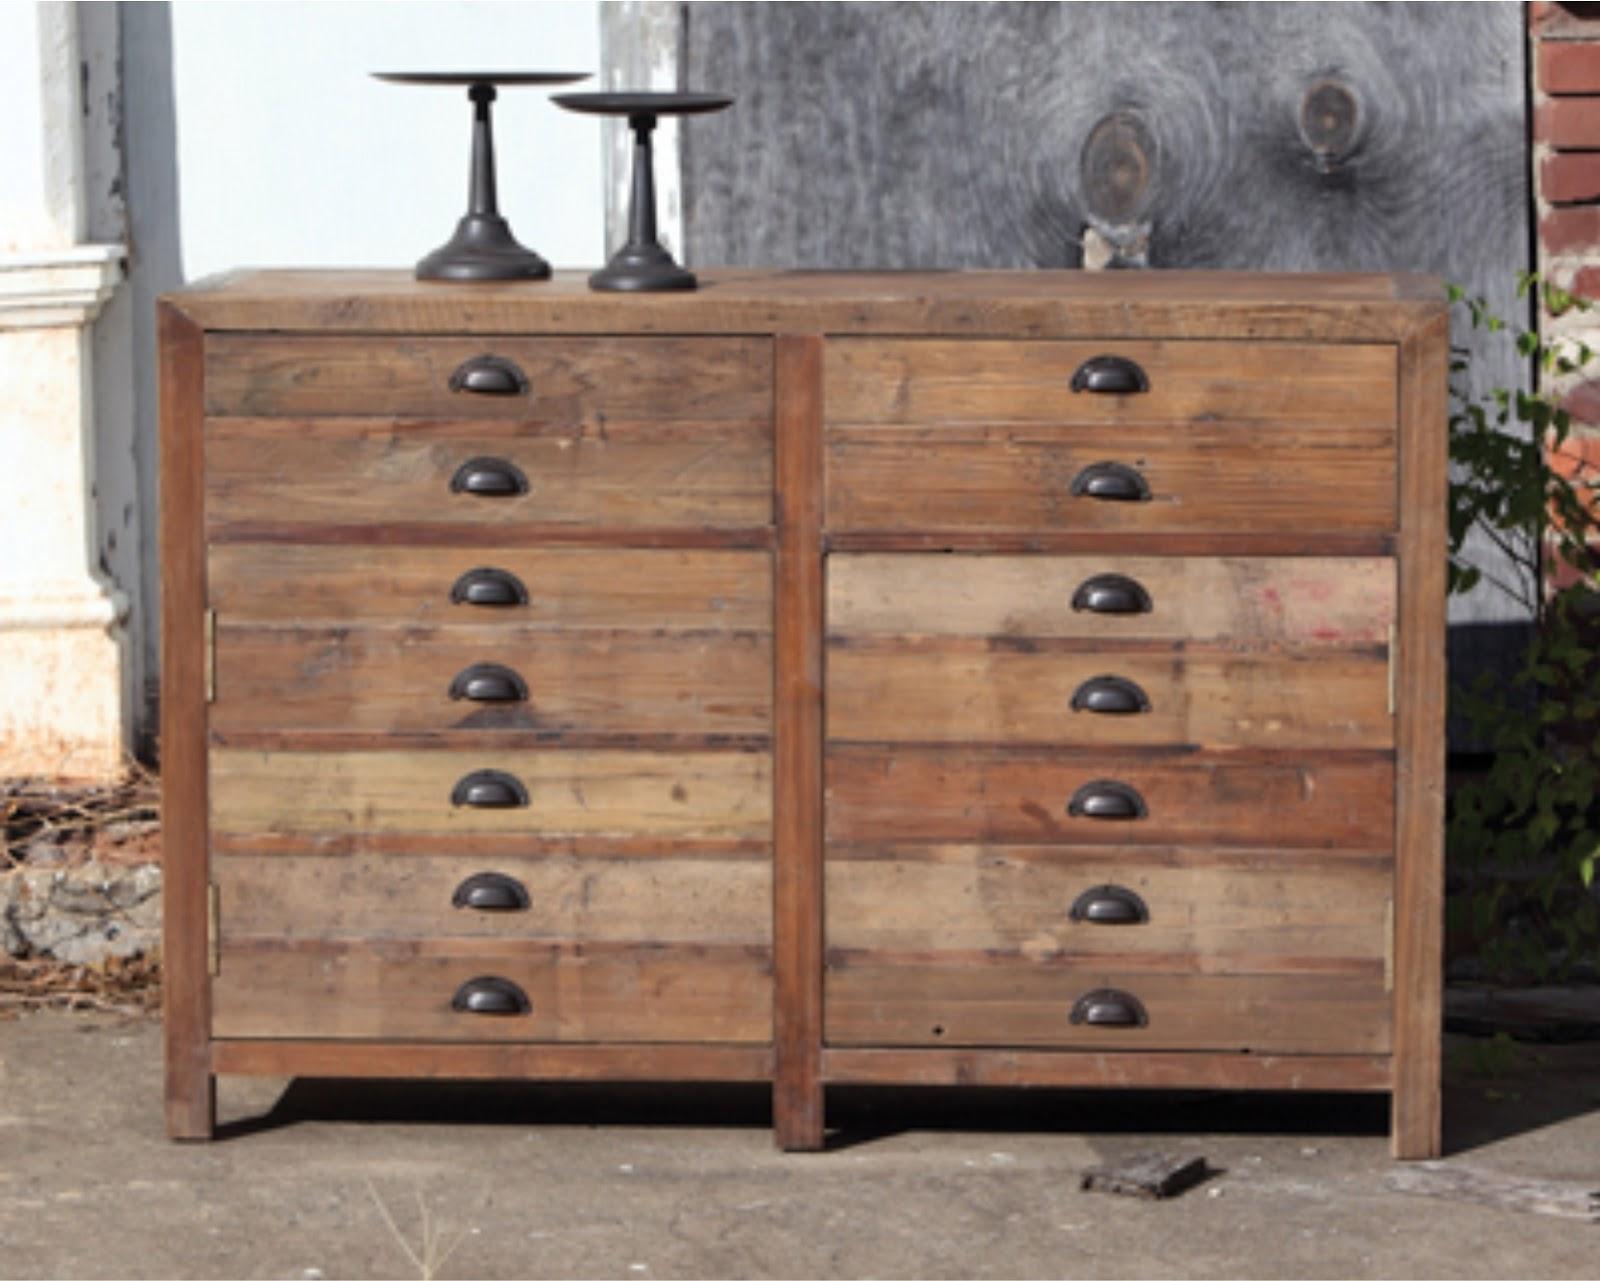 J Thaddeus Ozark39s Cookie Jars And Other Larks Cabinets